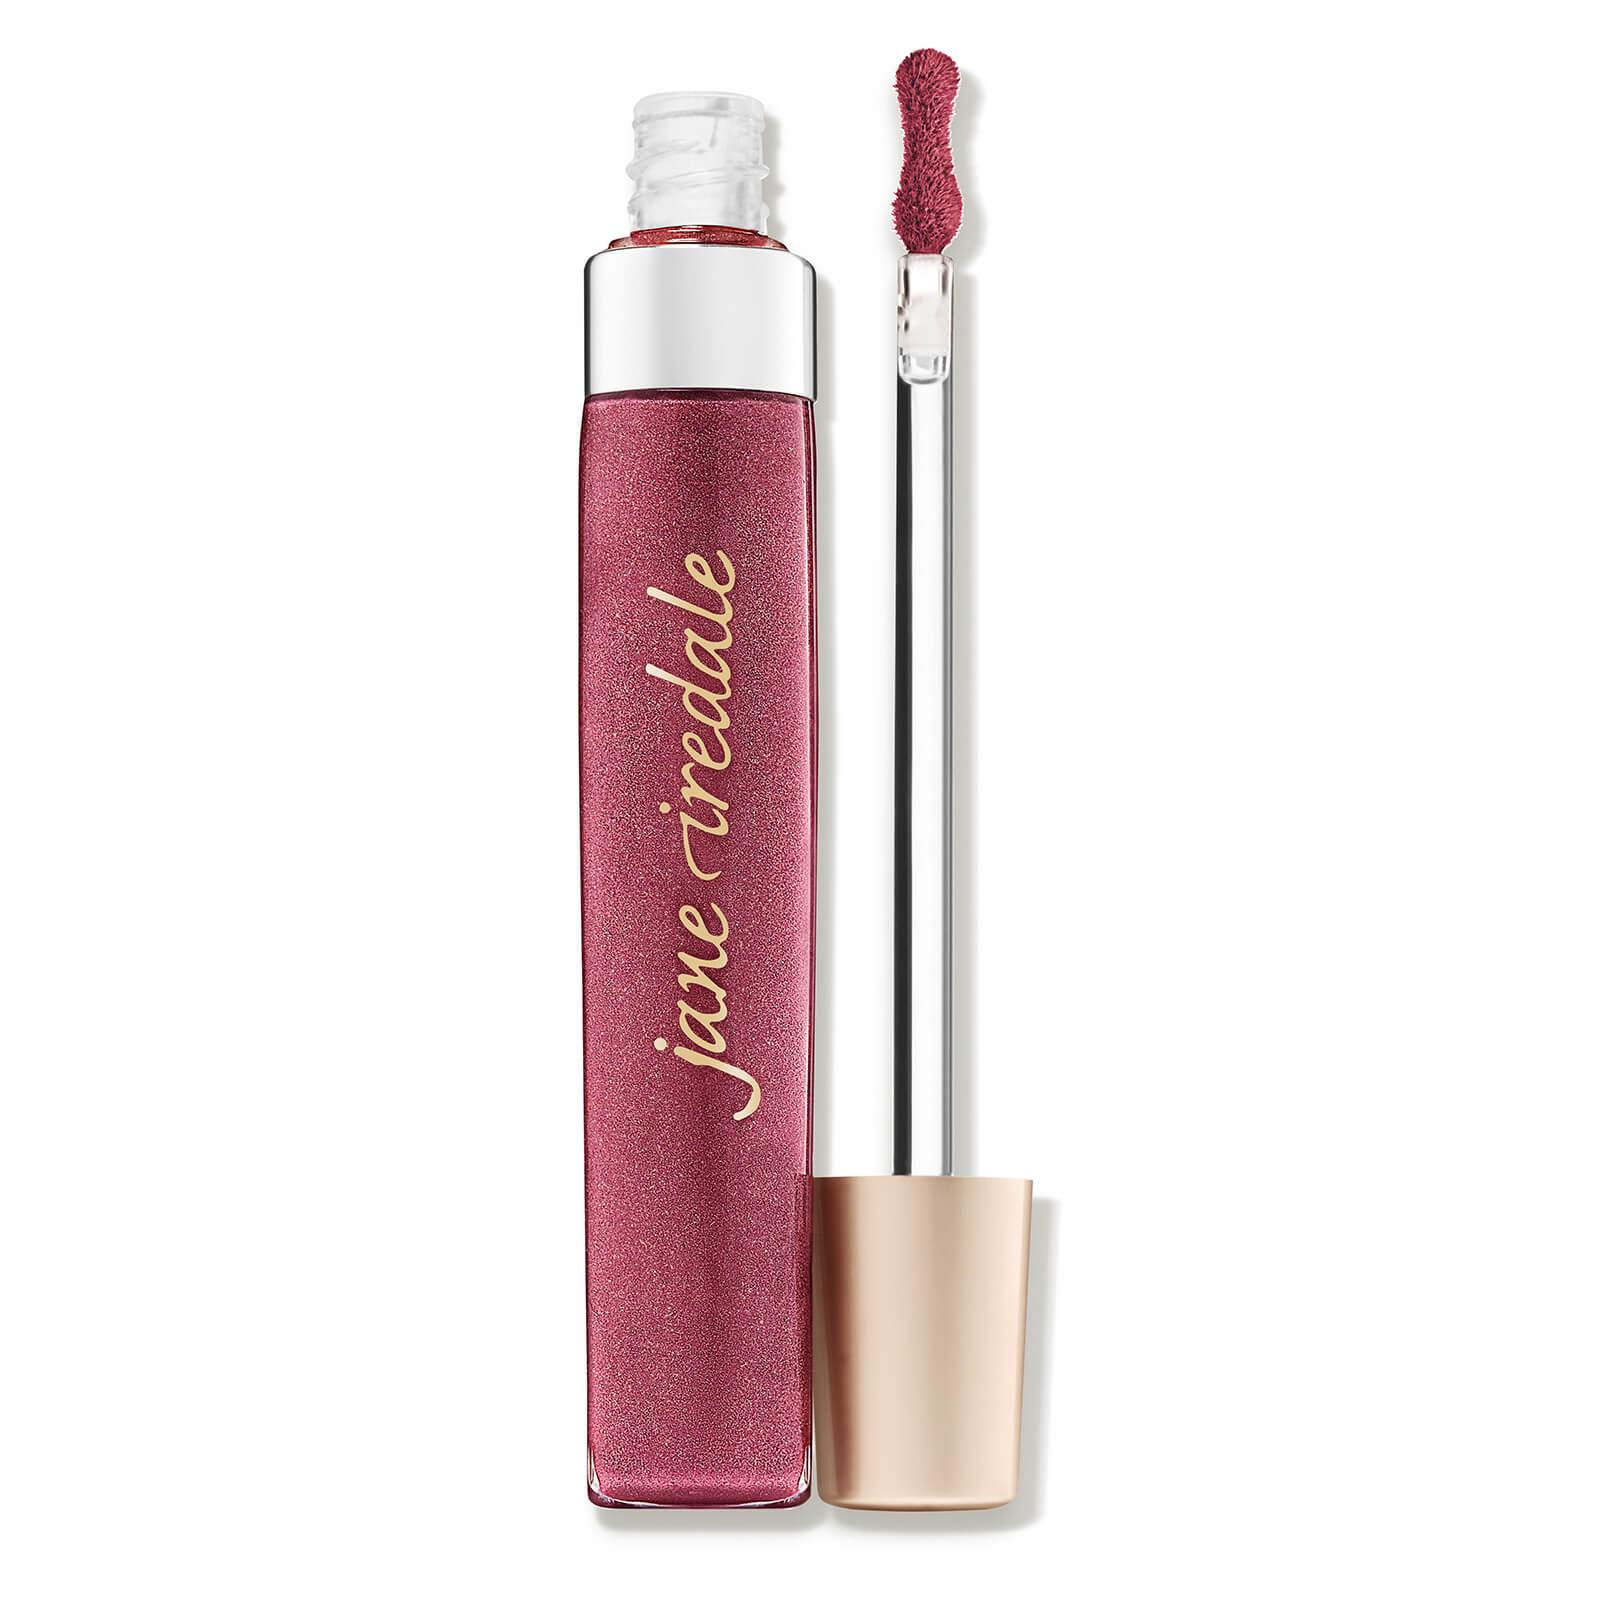 Jane Iredale Puregloss Lip Gloss - Snow Berry